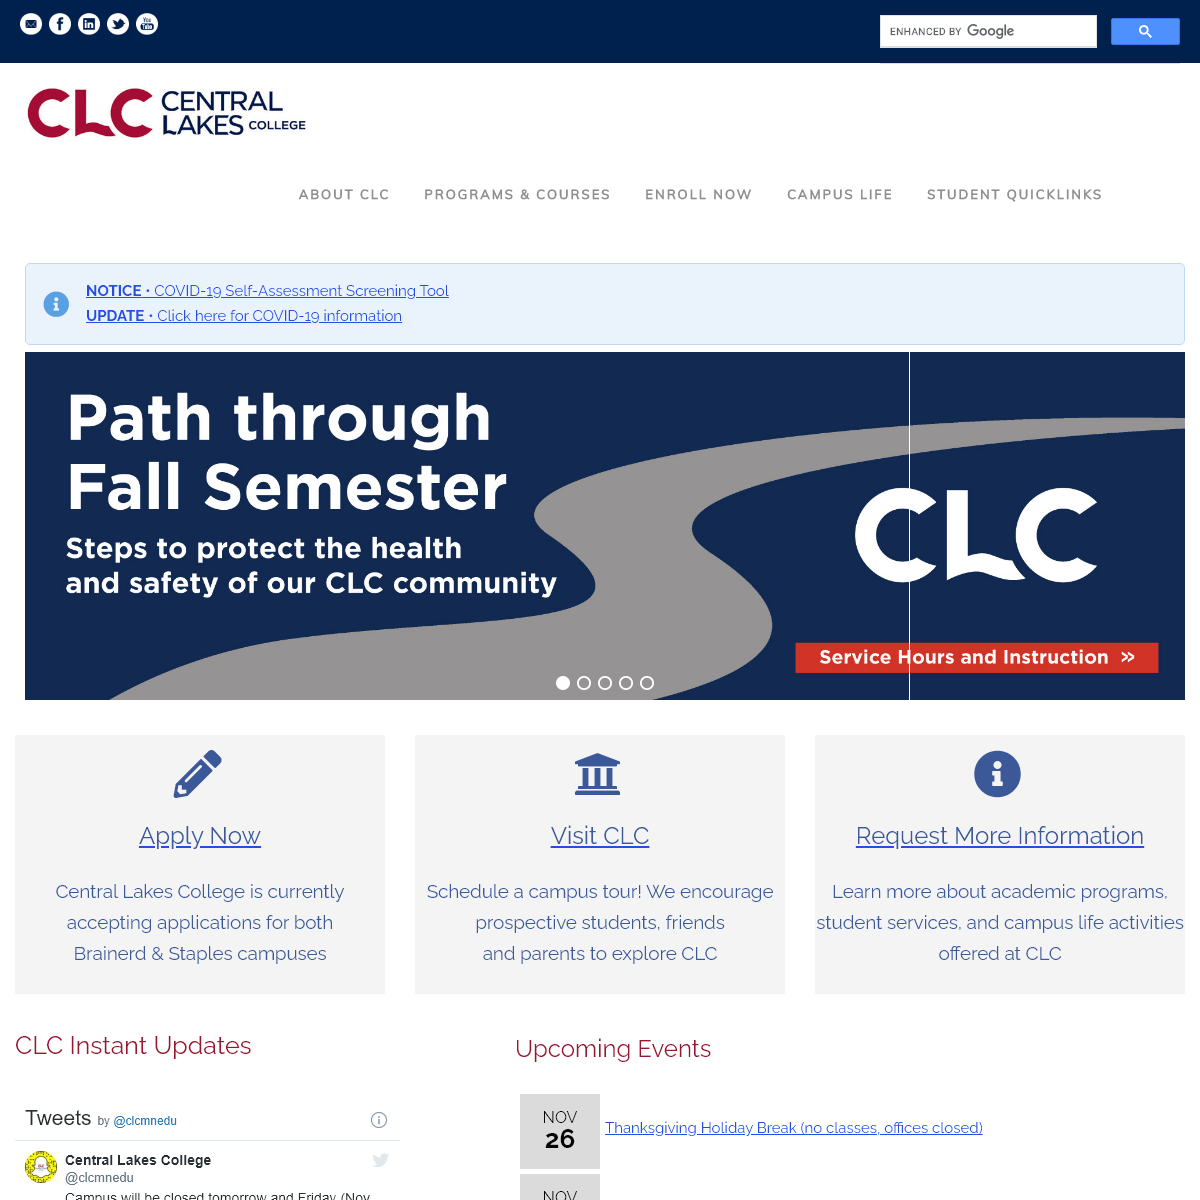 Central Lakes College - Central Lakes College